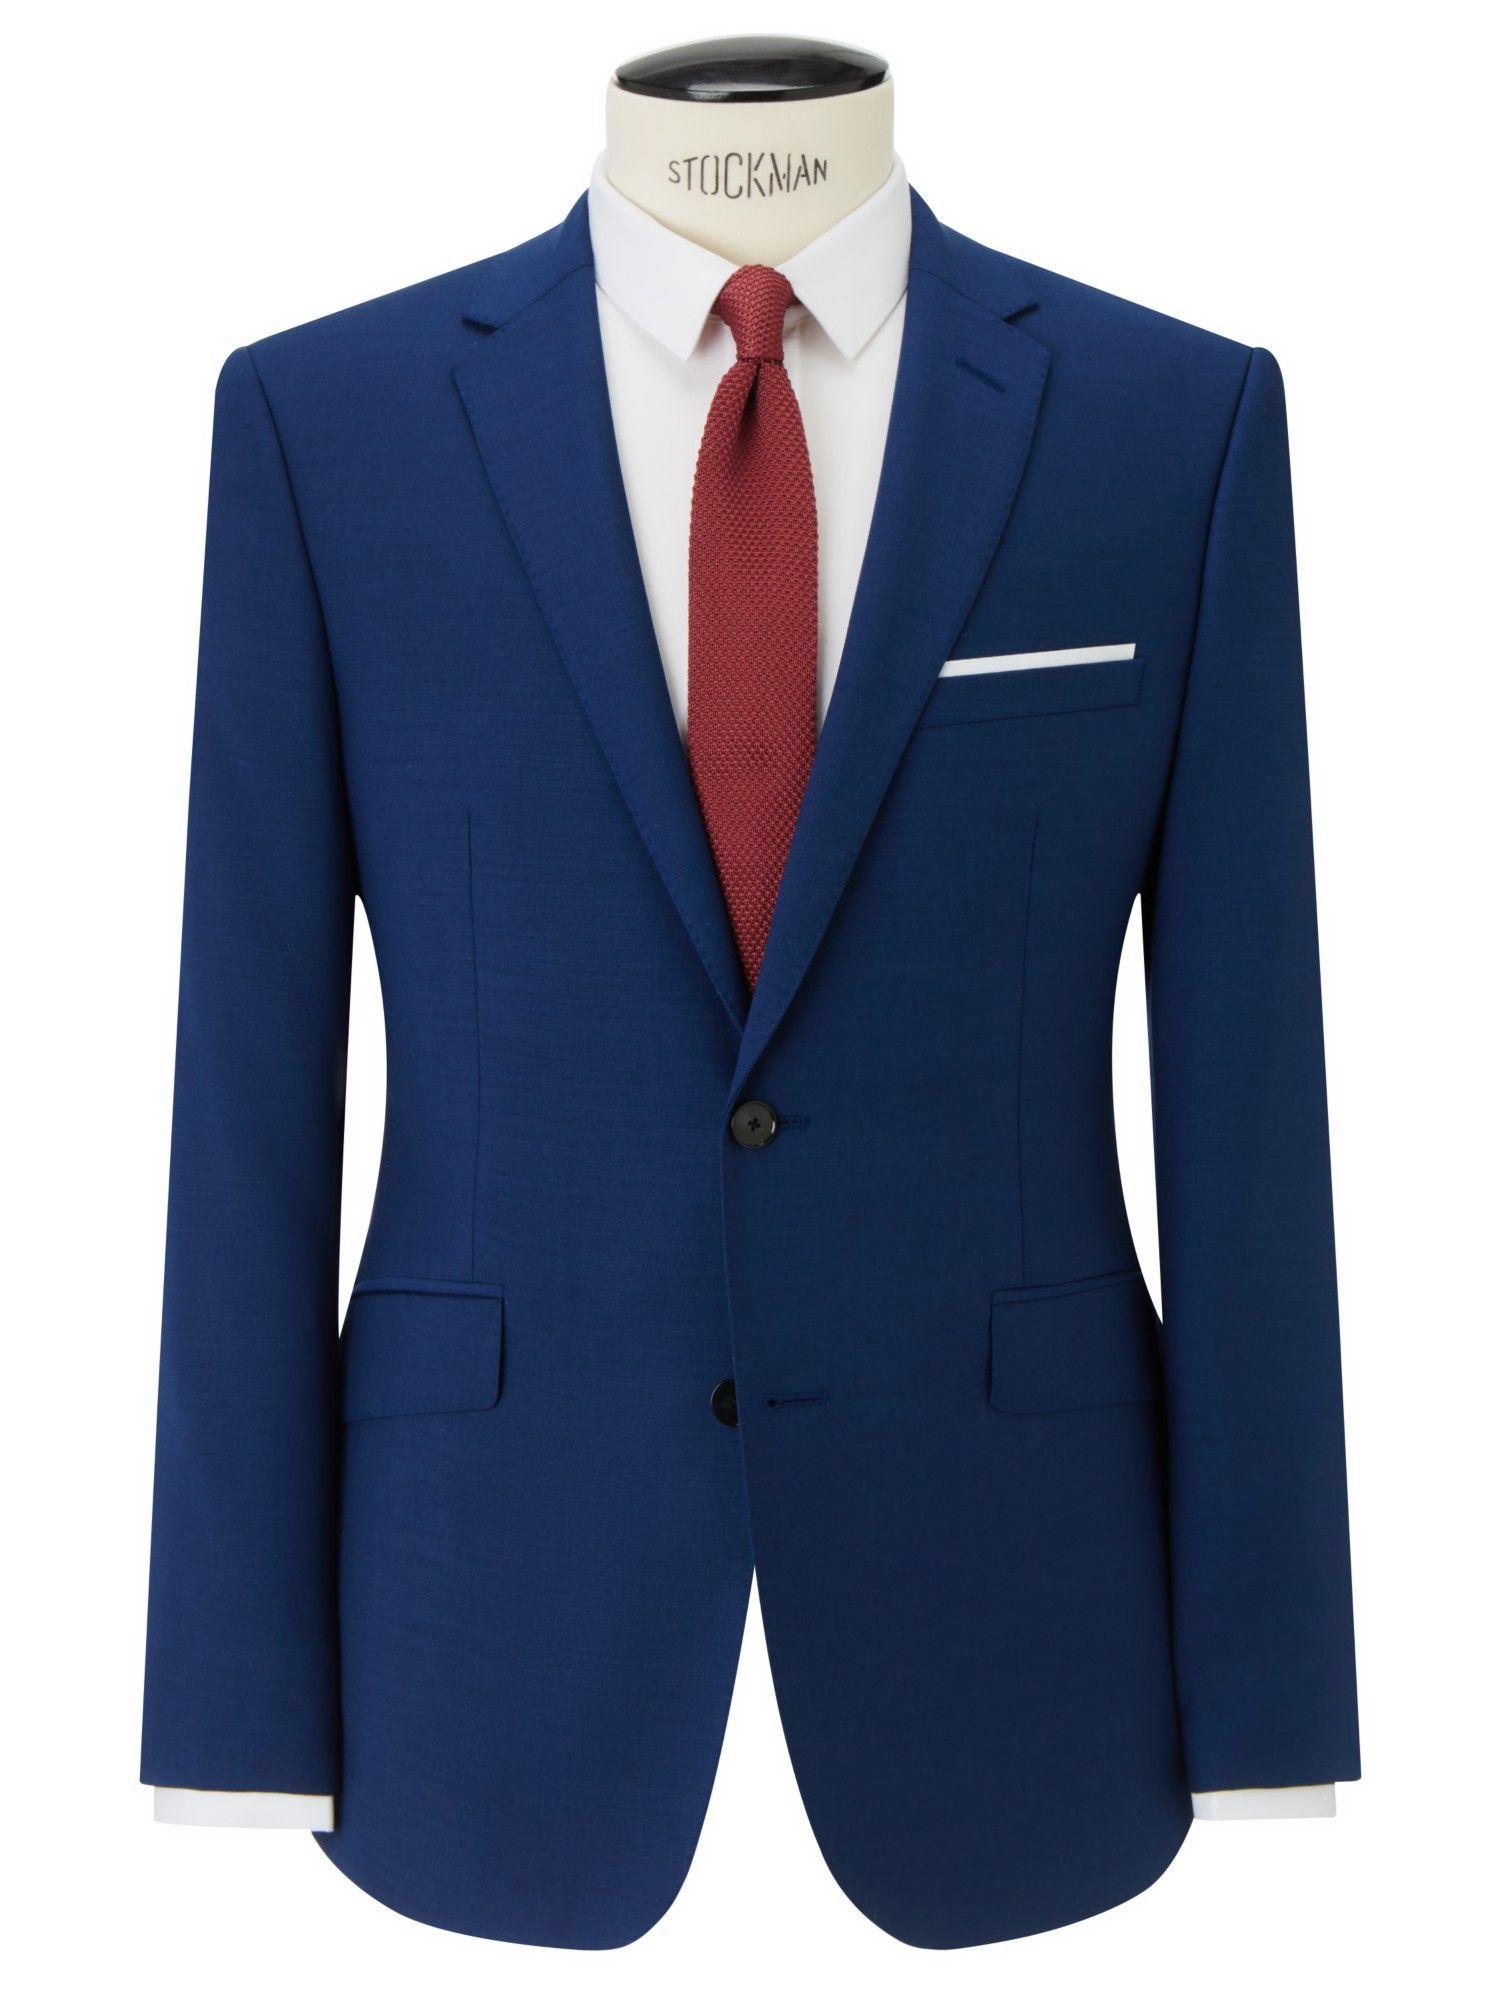 392e22deaa6 Kin by John Lewis Slim Fit Stamford Tonic Suit Jacket